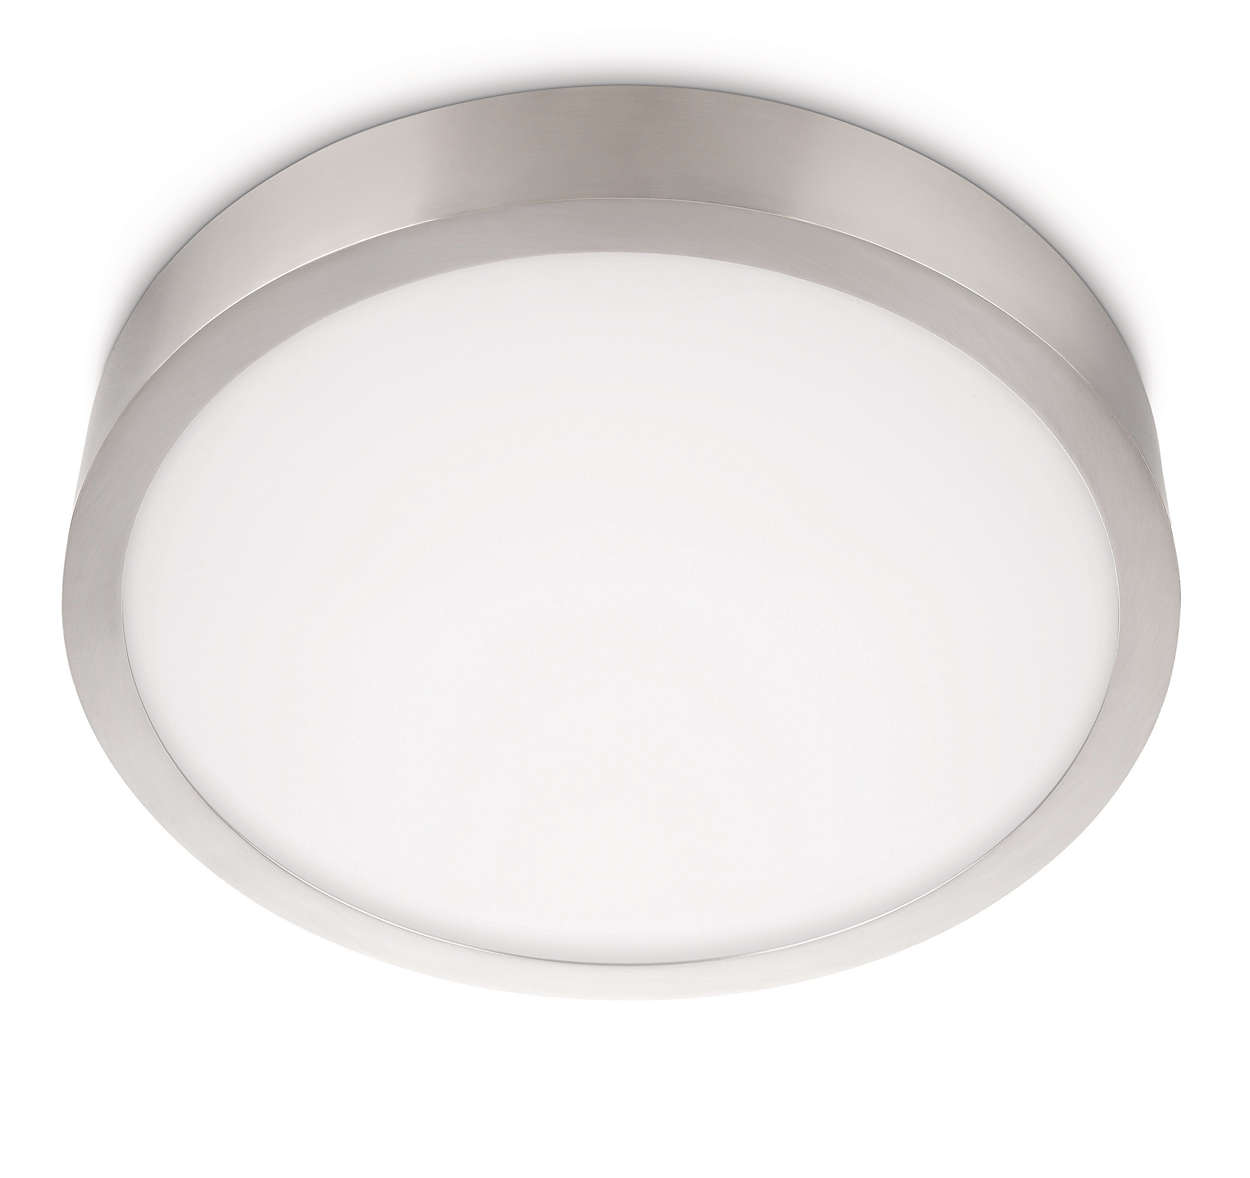 Decore a sua casa iluminando-a